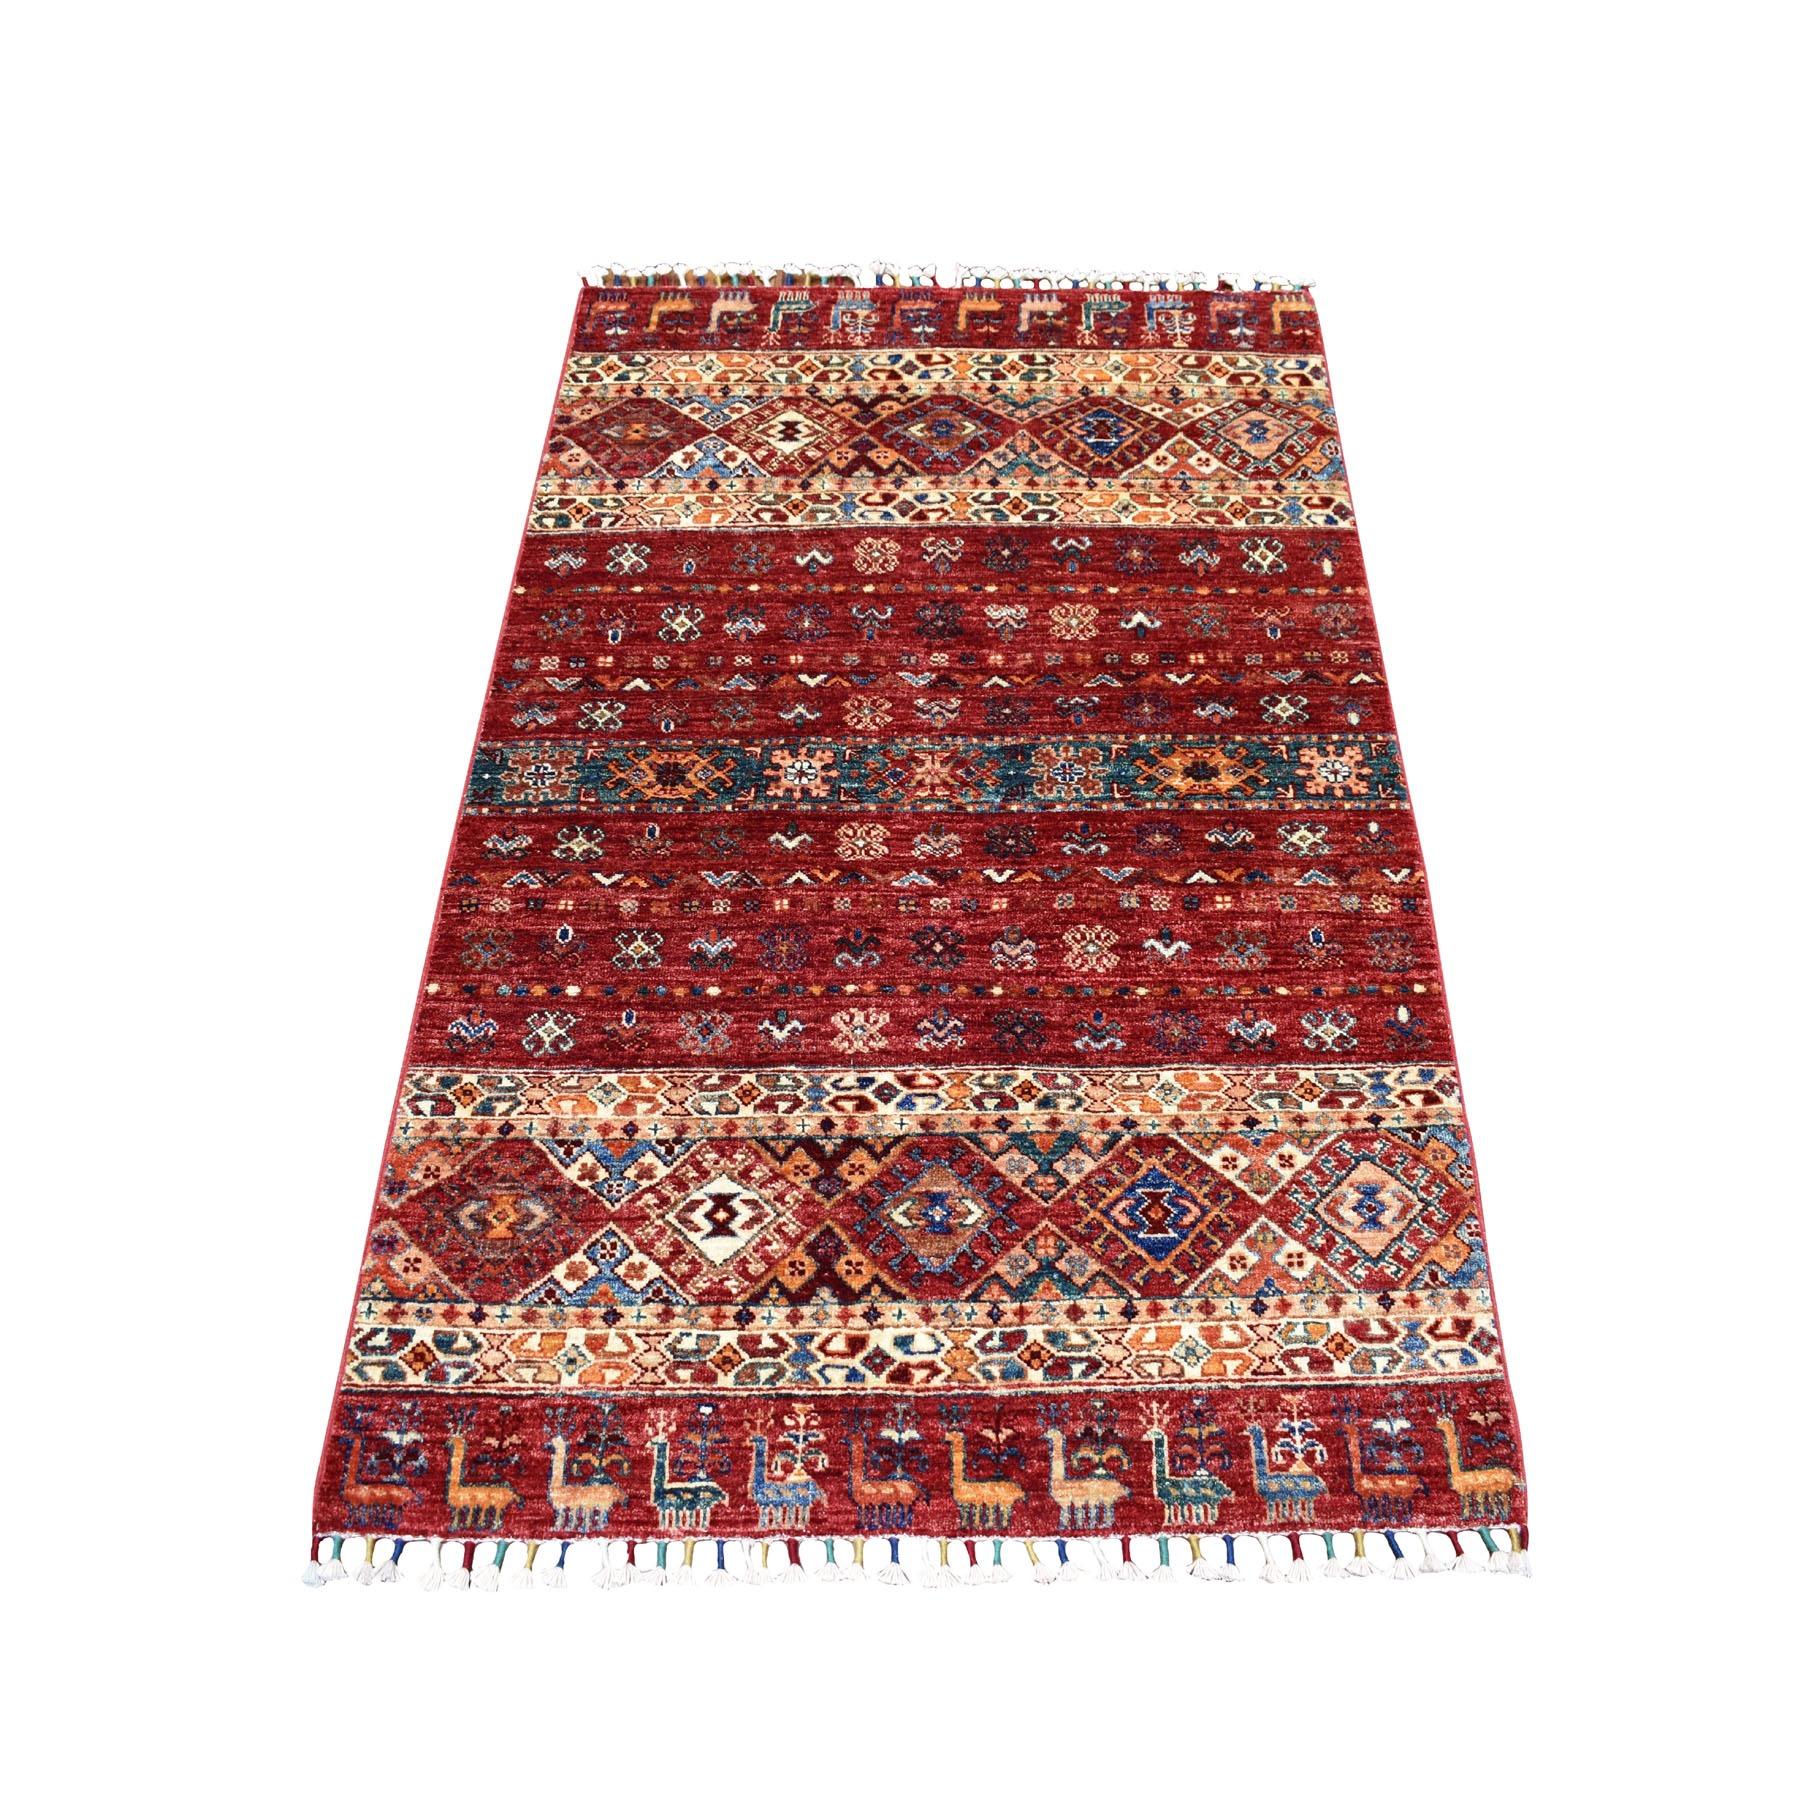 "3'4""x5' Khorjin Design Red Super Kazak Pure Wool Hand Knotted Oriental Rug"